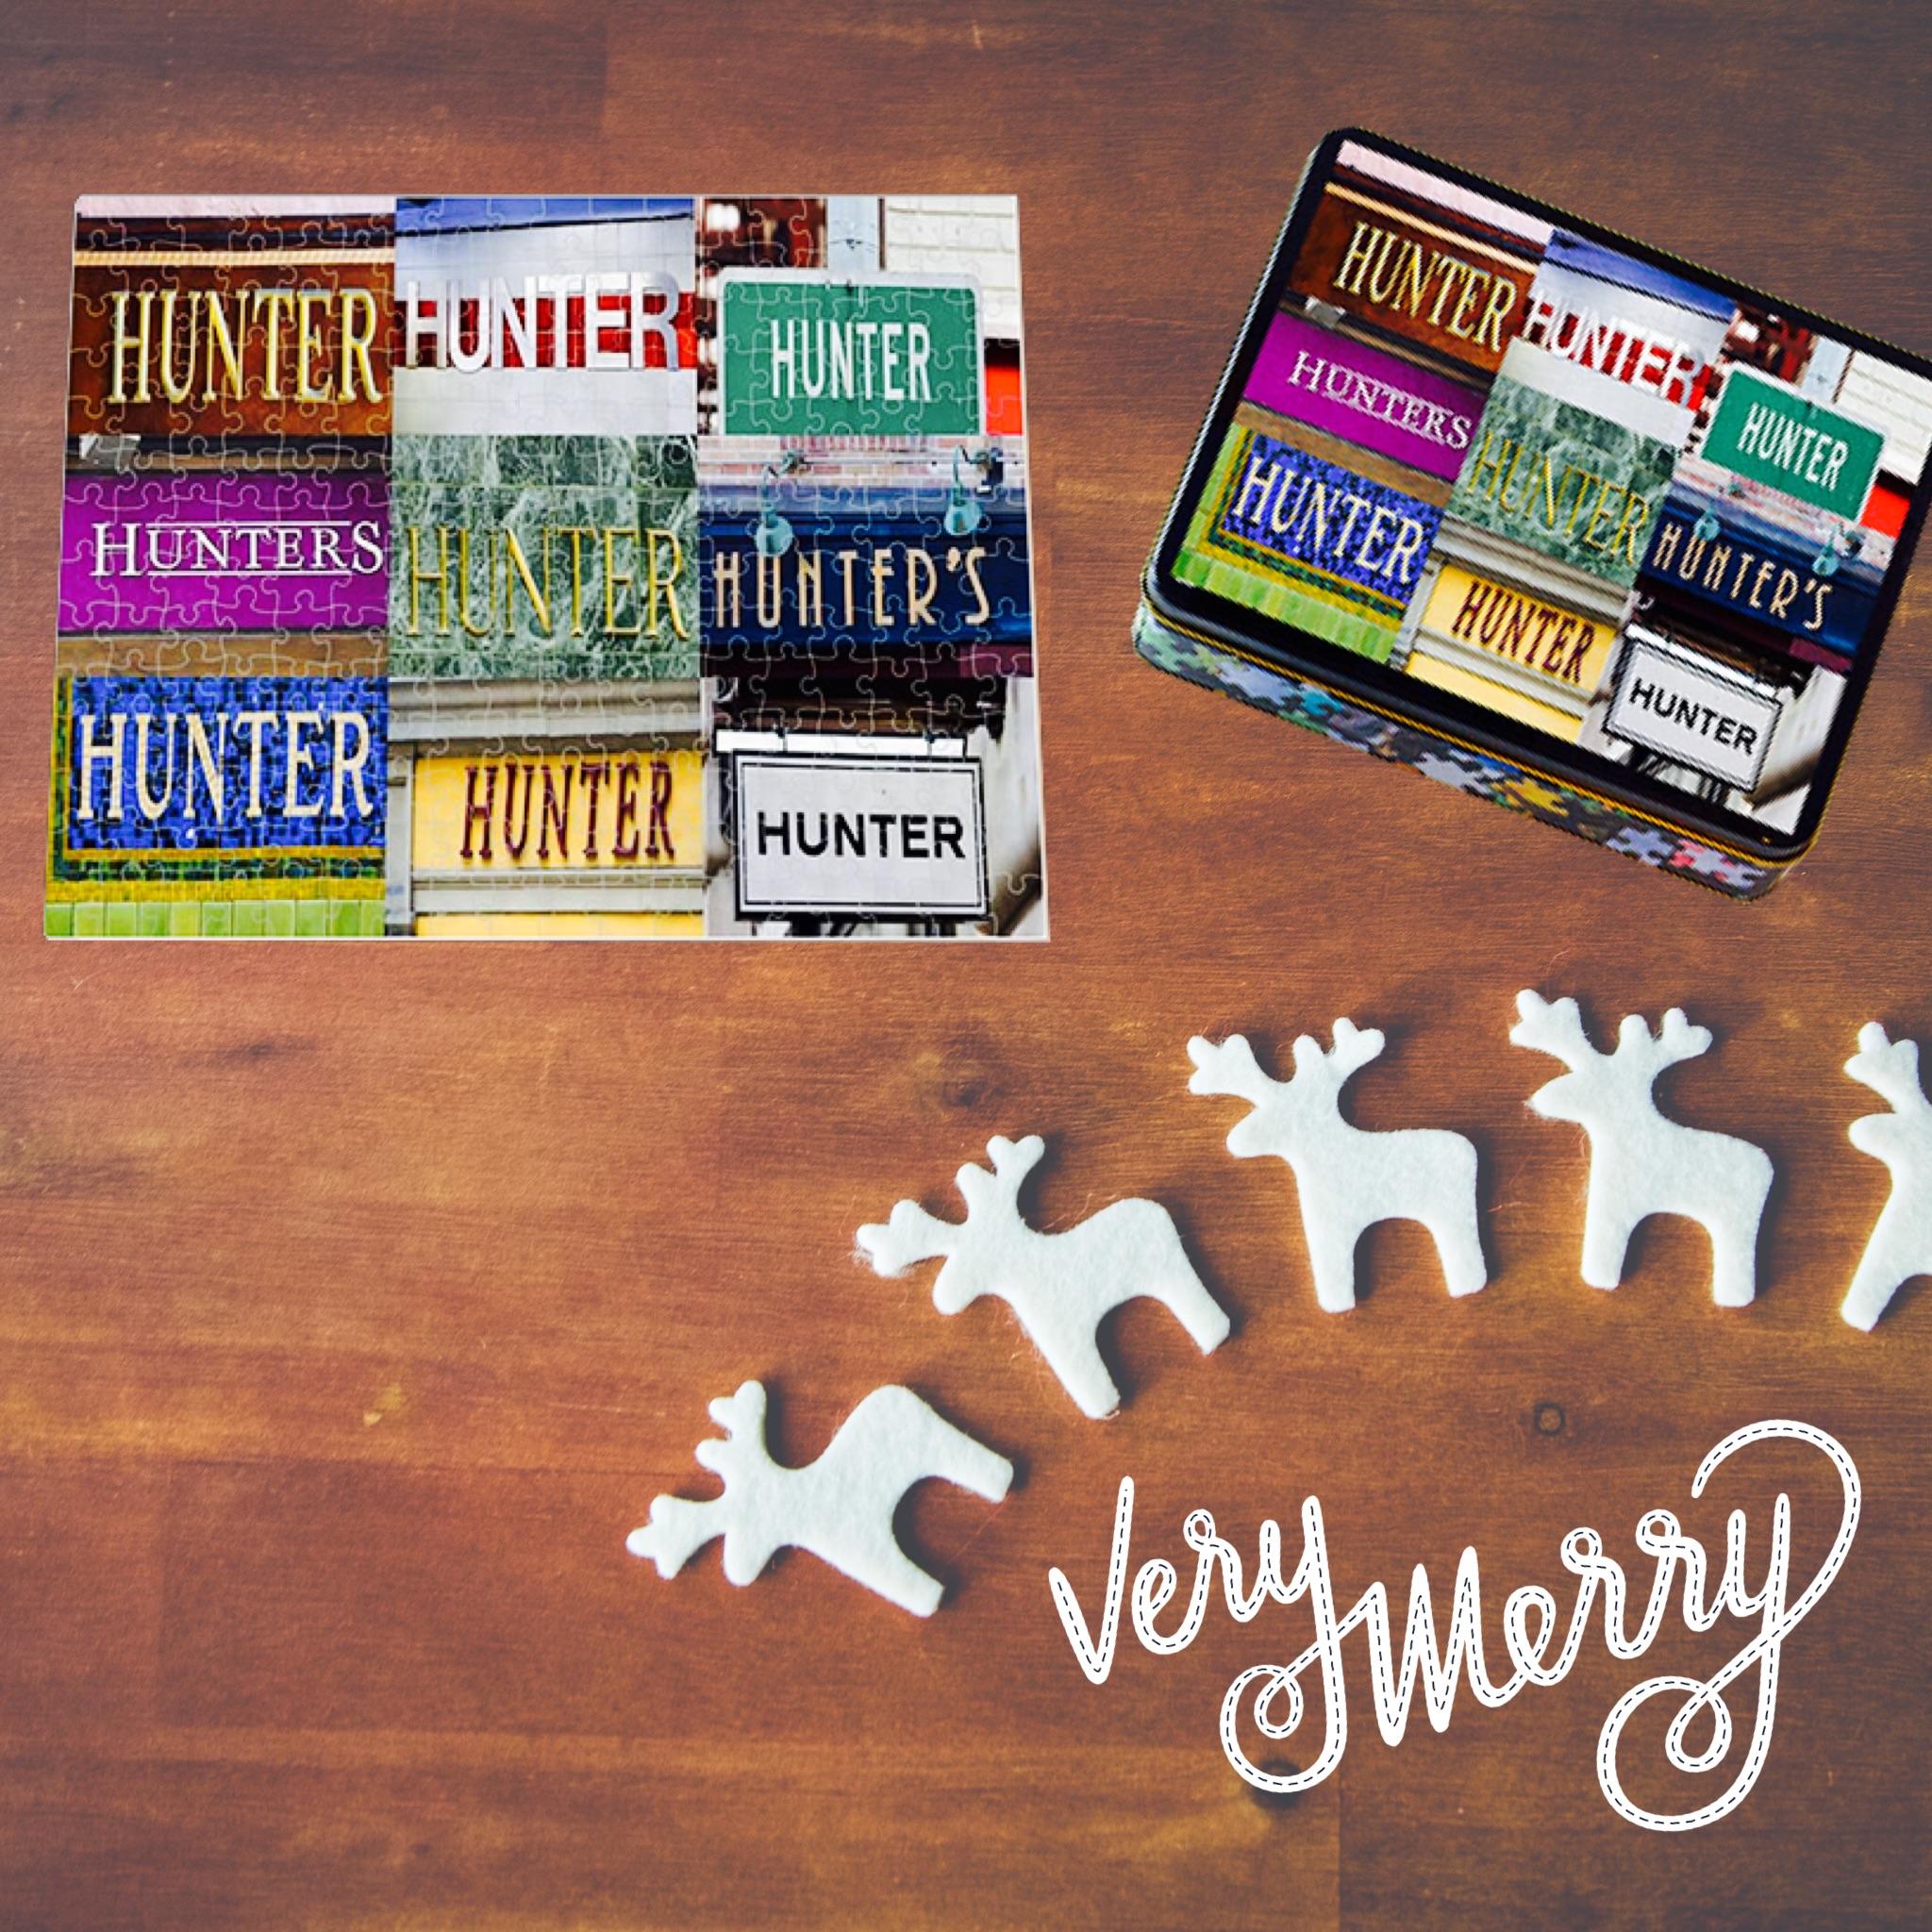 HunterPuzzlePost.jpg